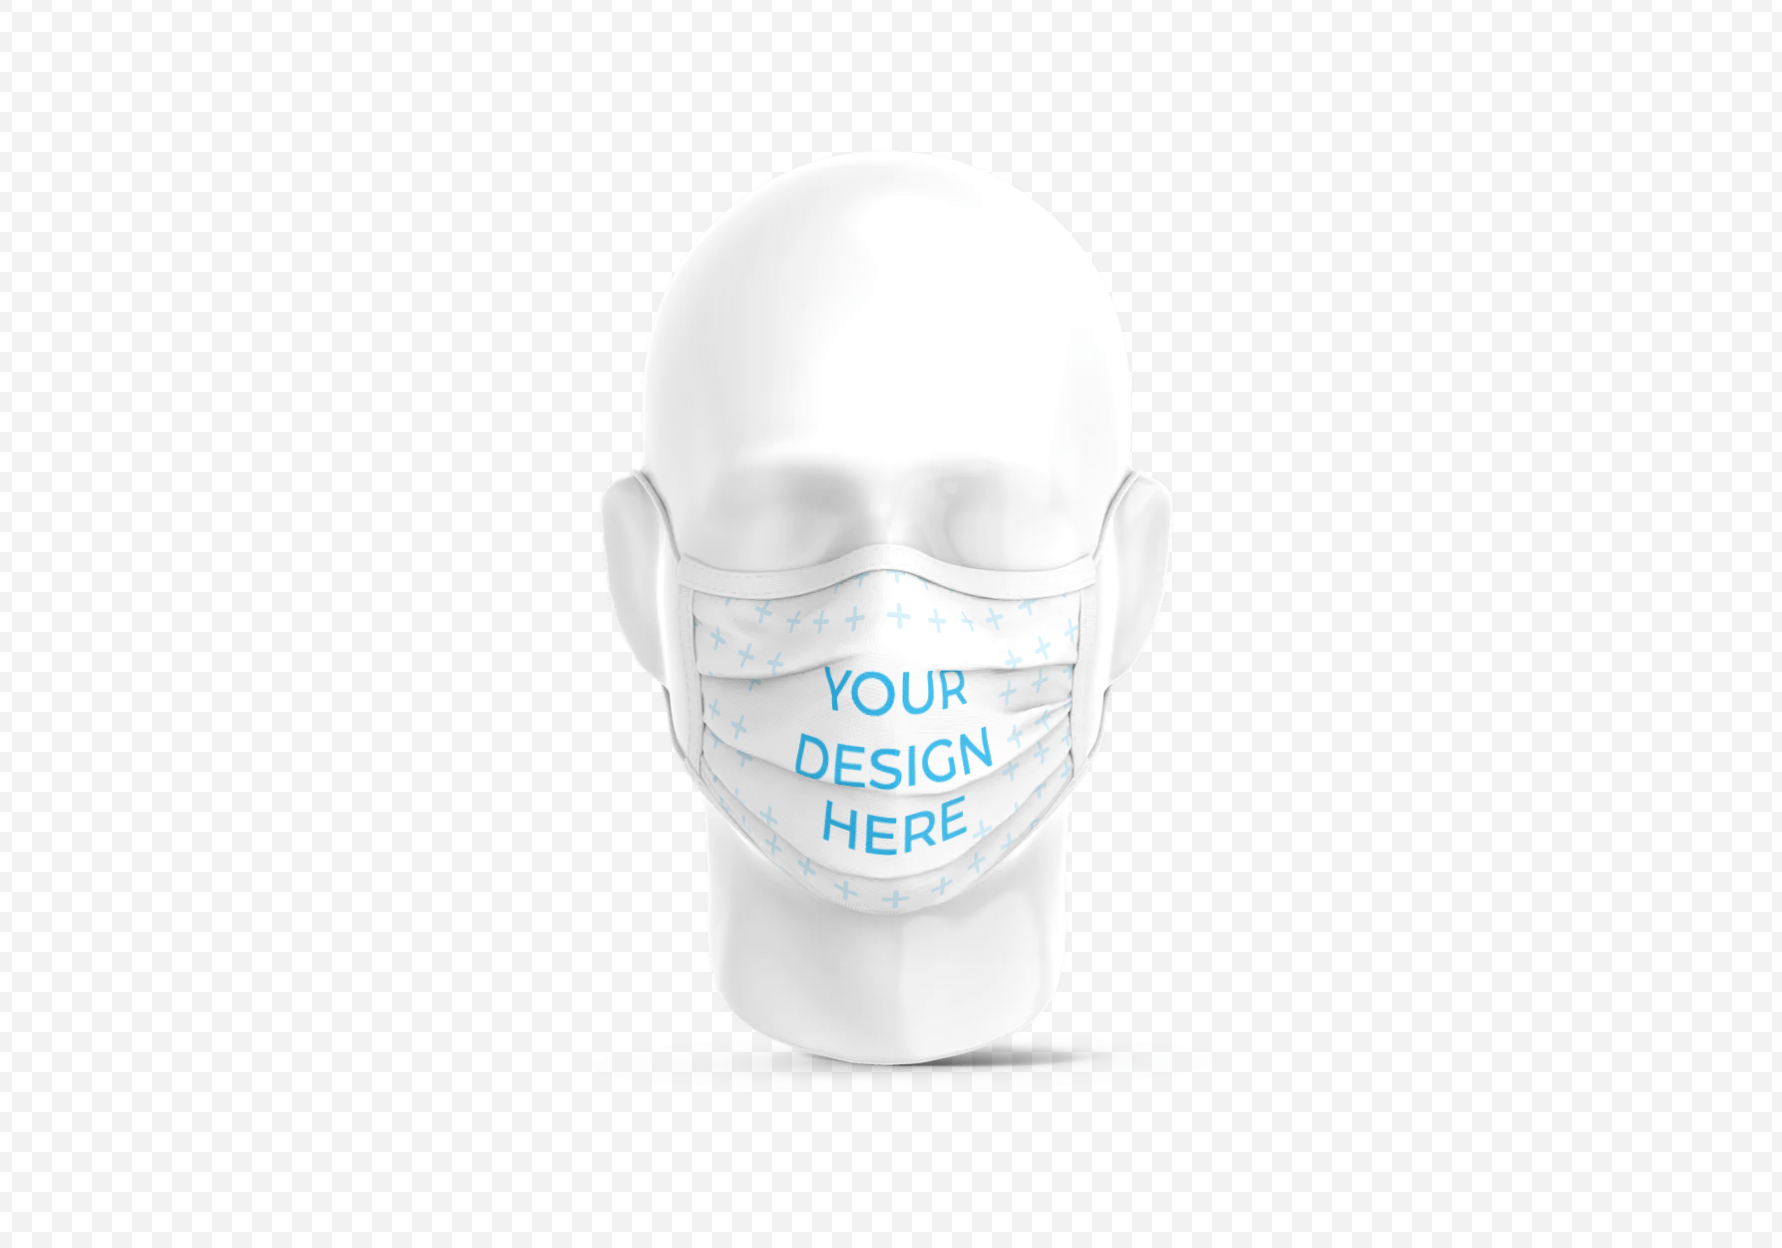 Surgical Mask on Plastic Head Mockup